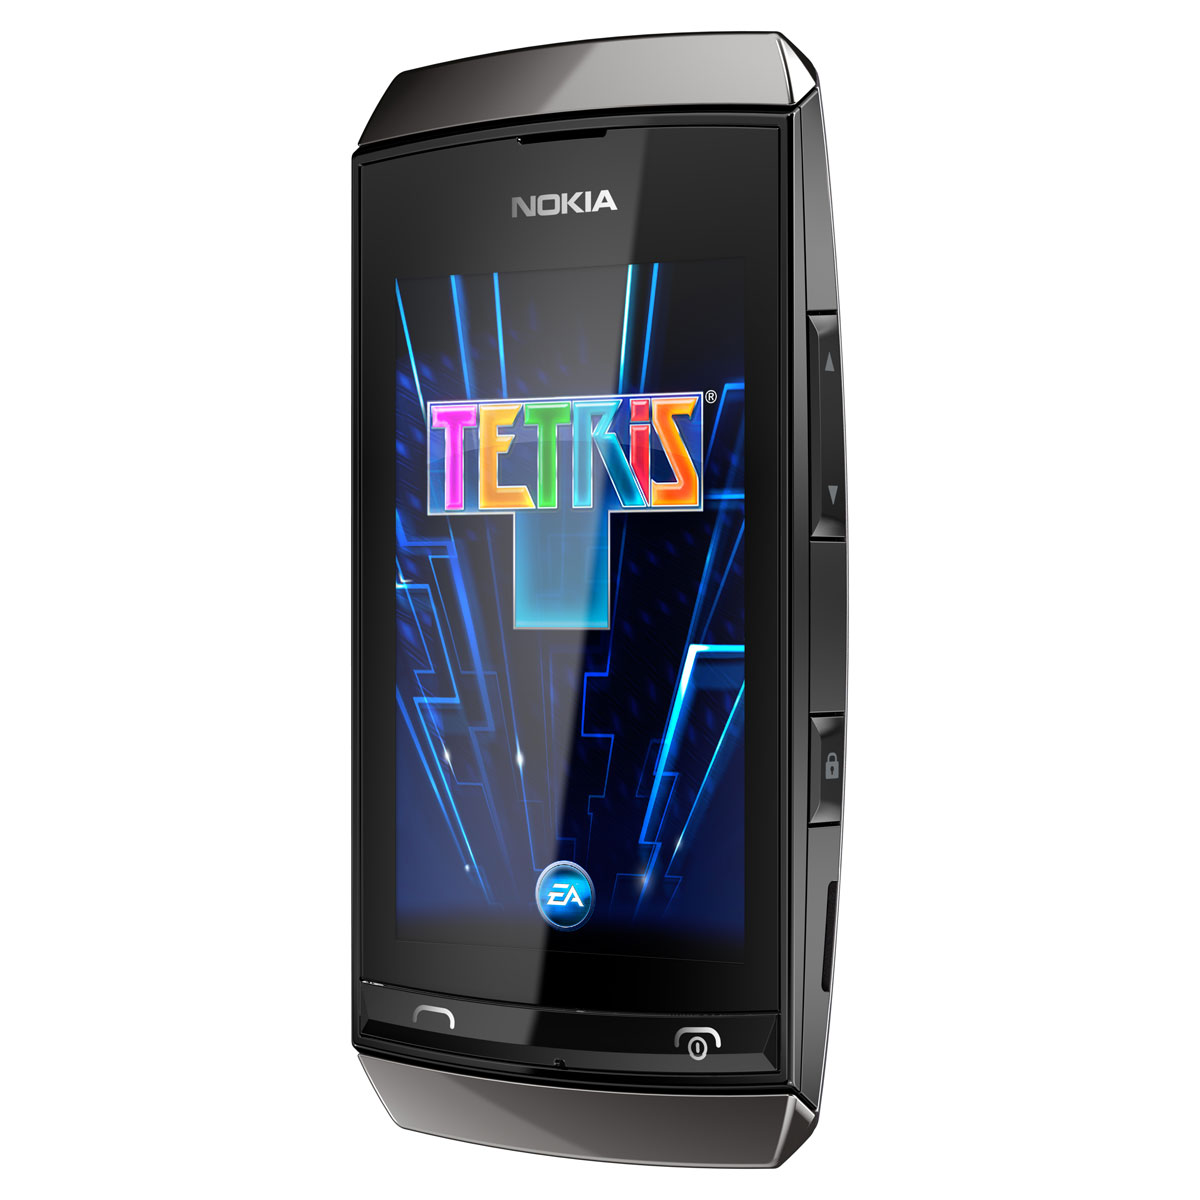 "Mobile & smartphone Nokia Asha 306 Gris Smartphone 2G avec écran 3"" et Wi-Fi"